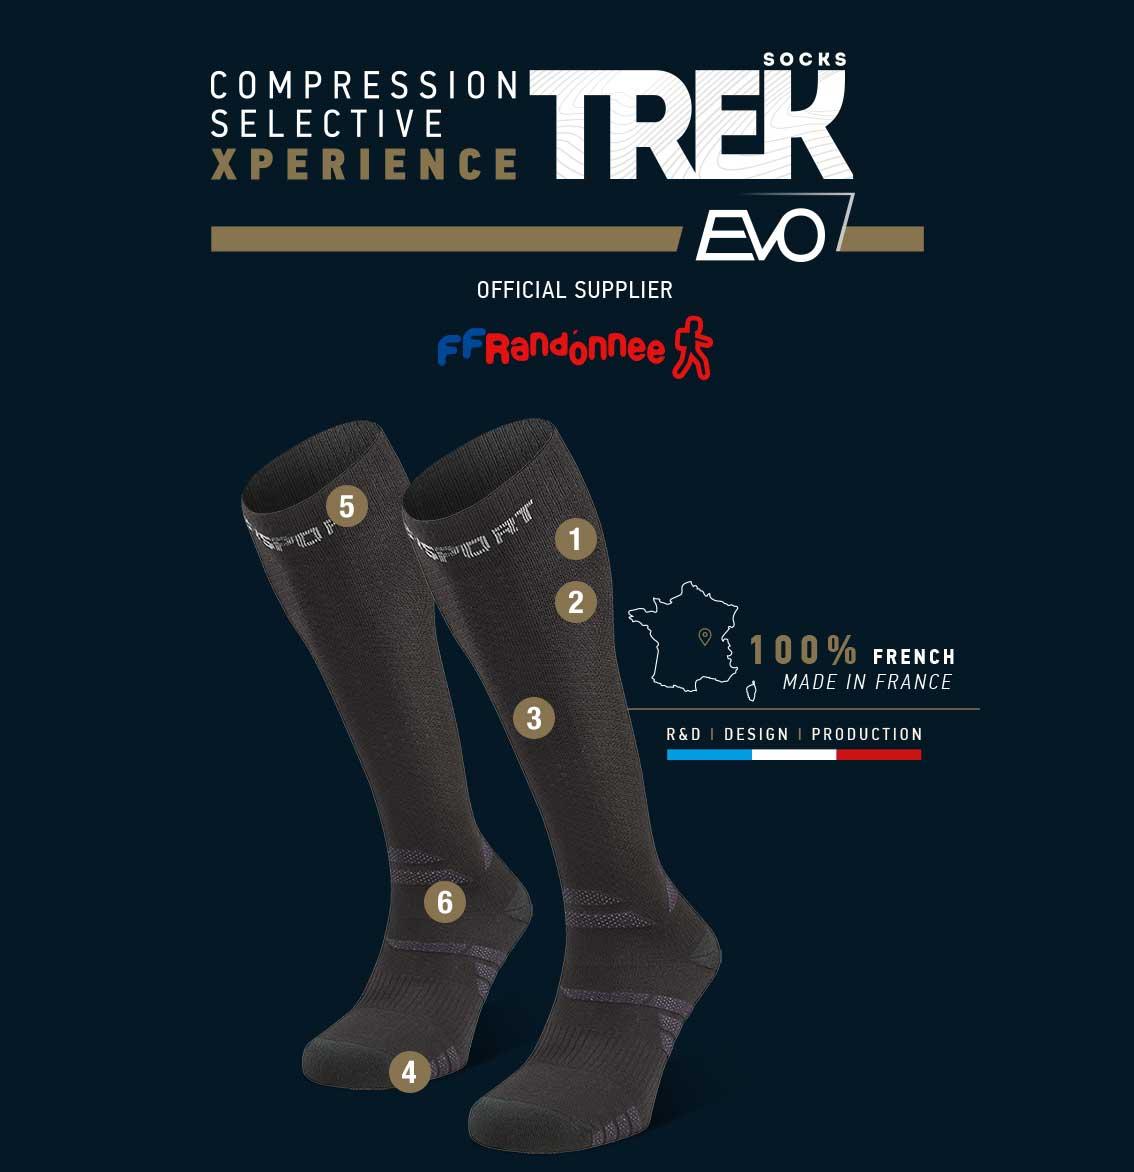 Hiking_socks_Trek_compression_EVO_black-grey